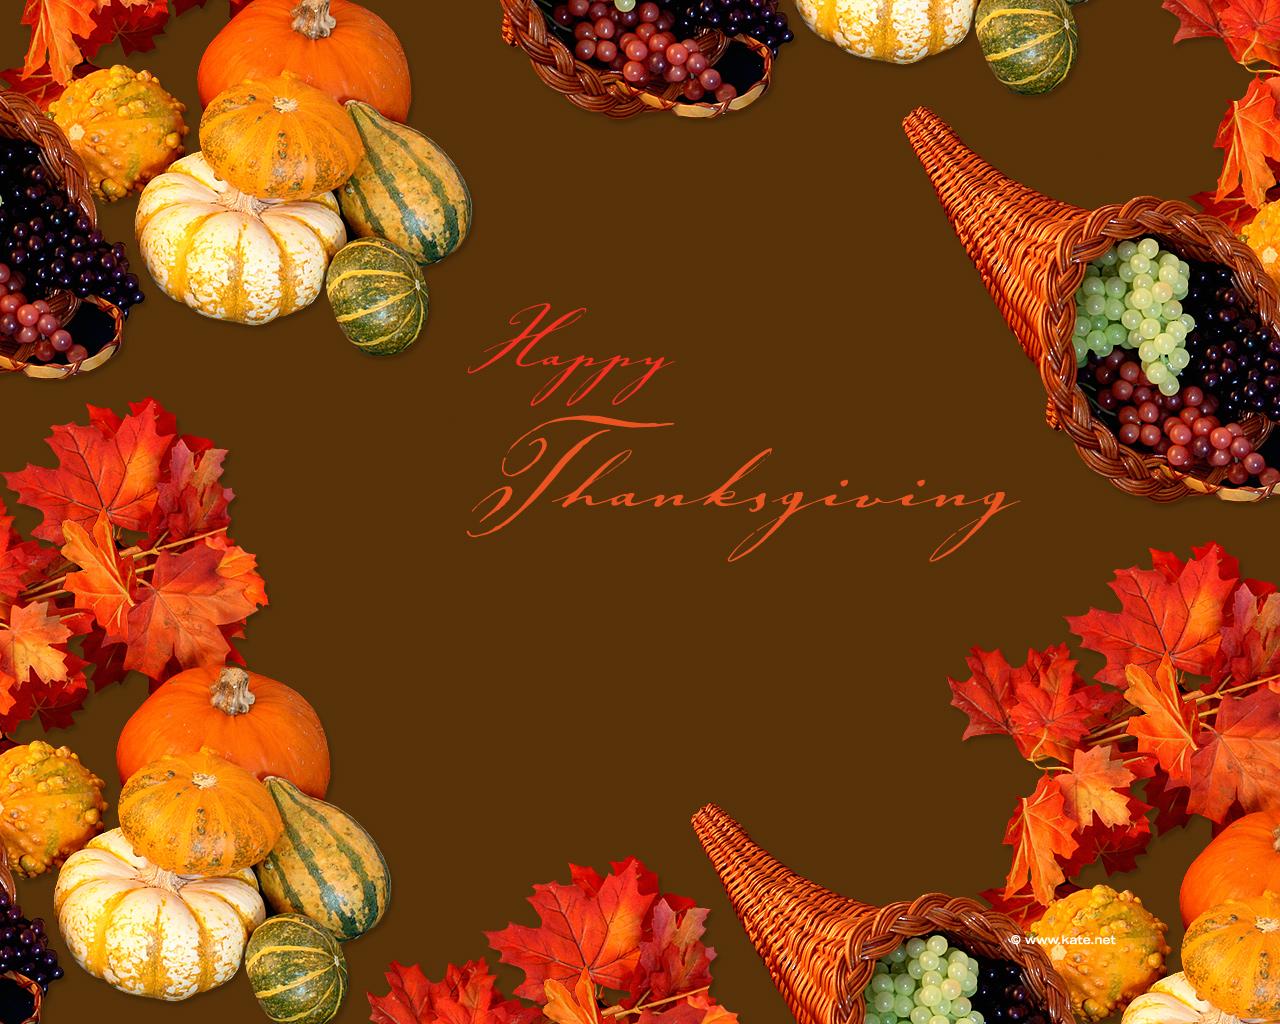 http://4.bp.blogspot.com/-1xrRKPz9aao/Ts56az8p86I/AAAAAAAAA7w/ziFb8gaw62Y/s1600/thanksgiving_wallpaper-4811.jpg